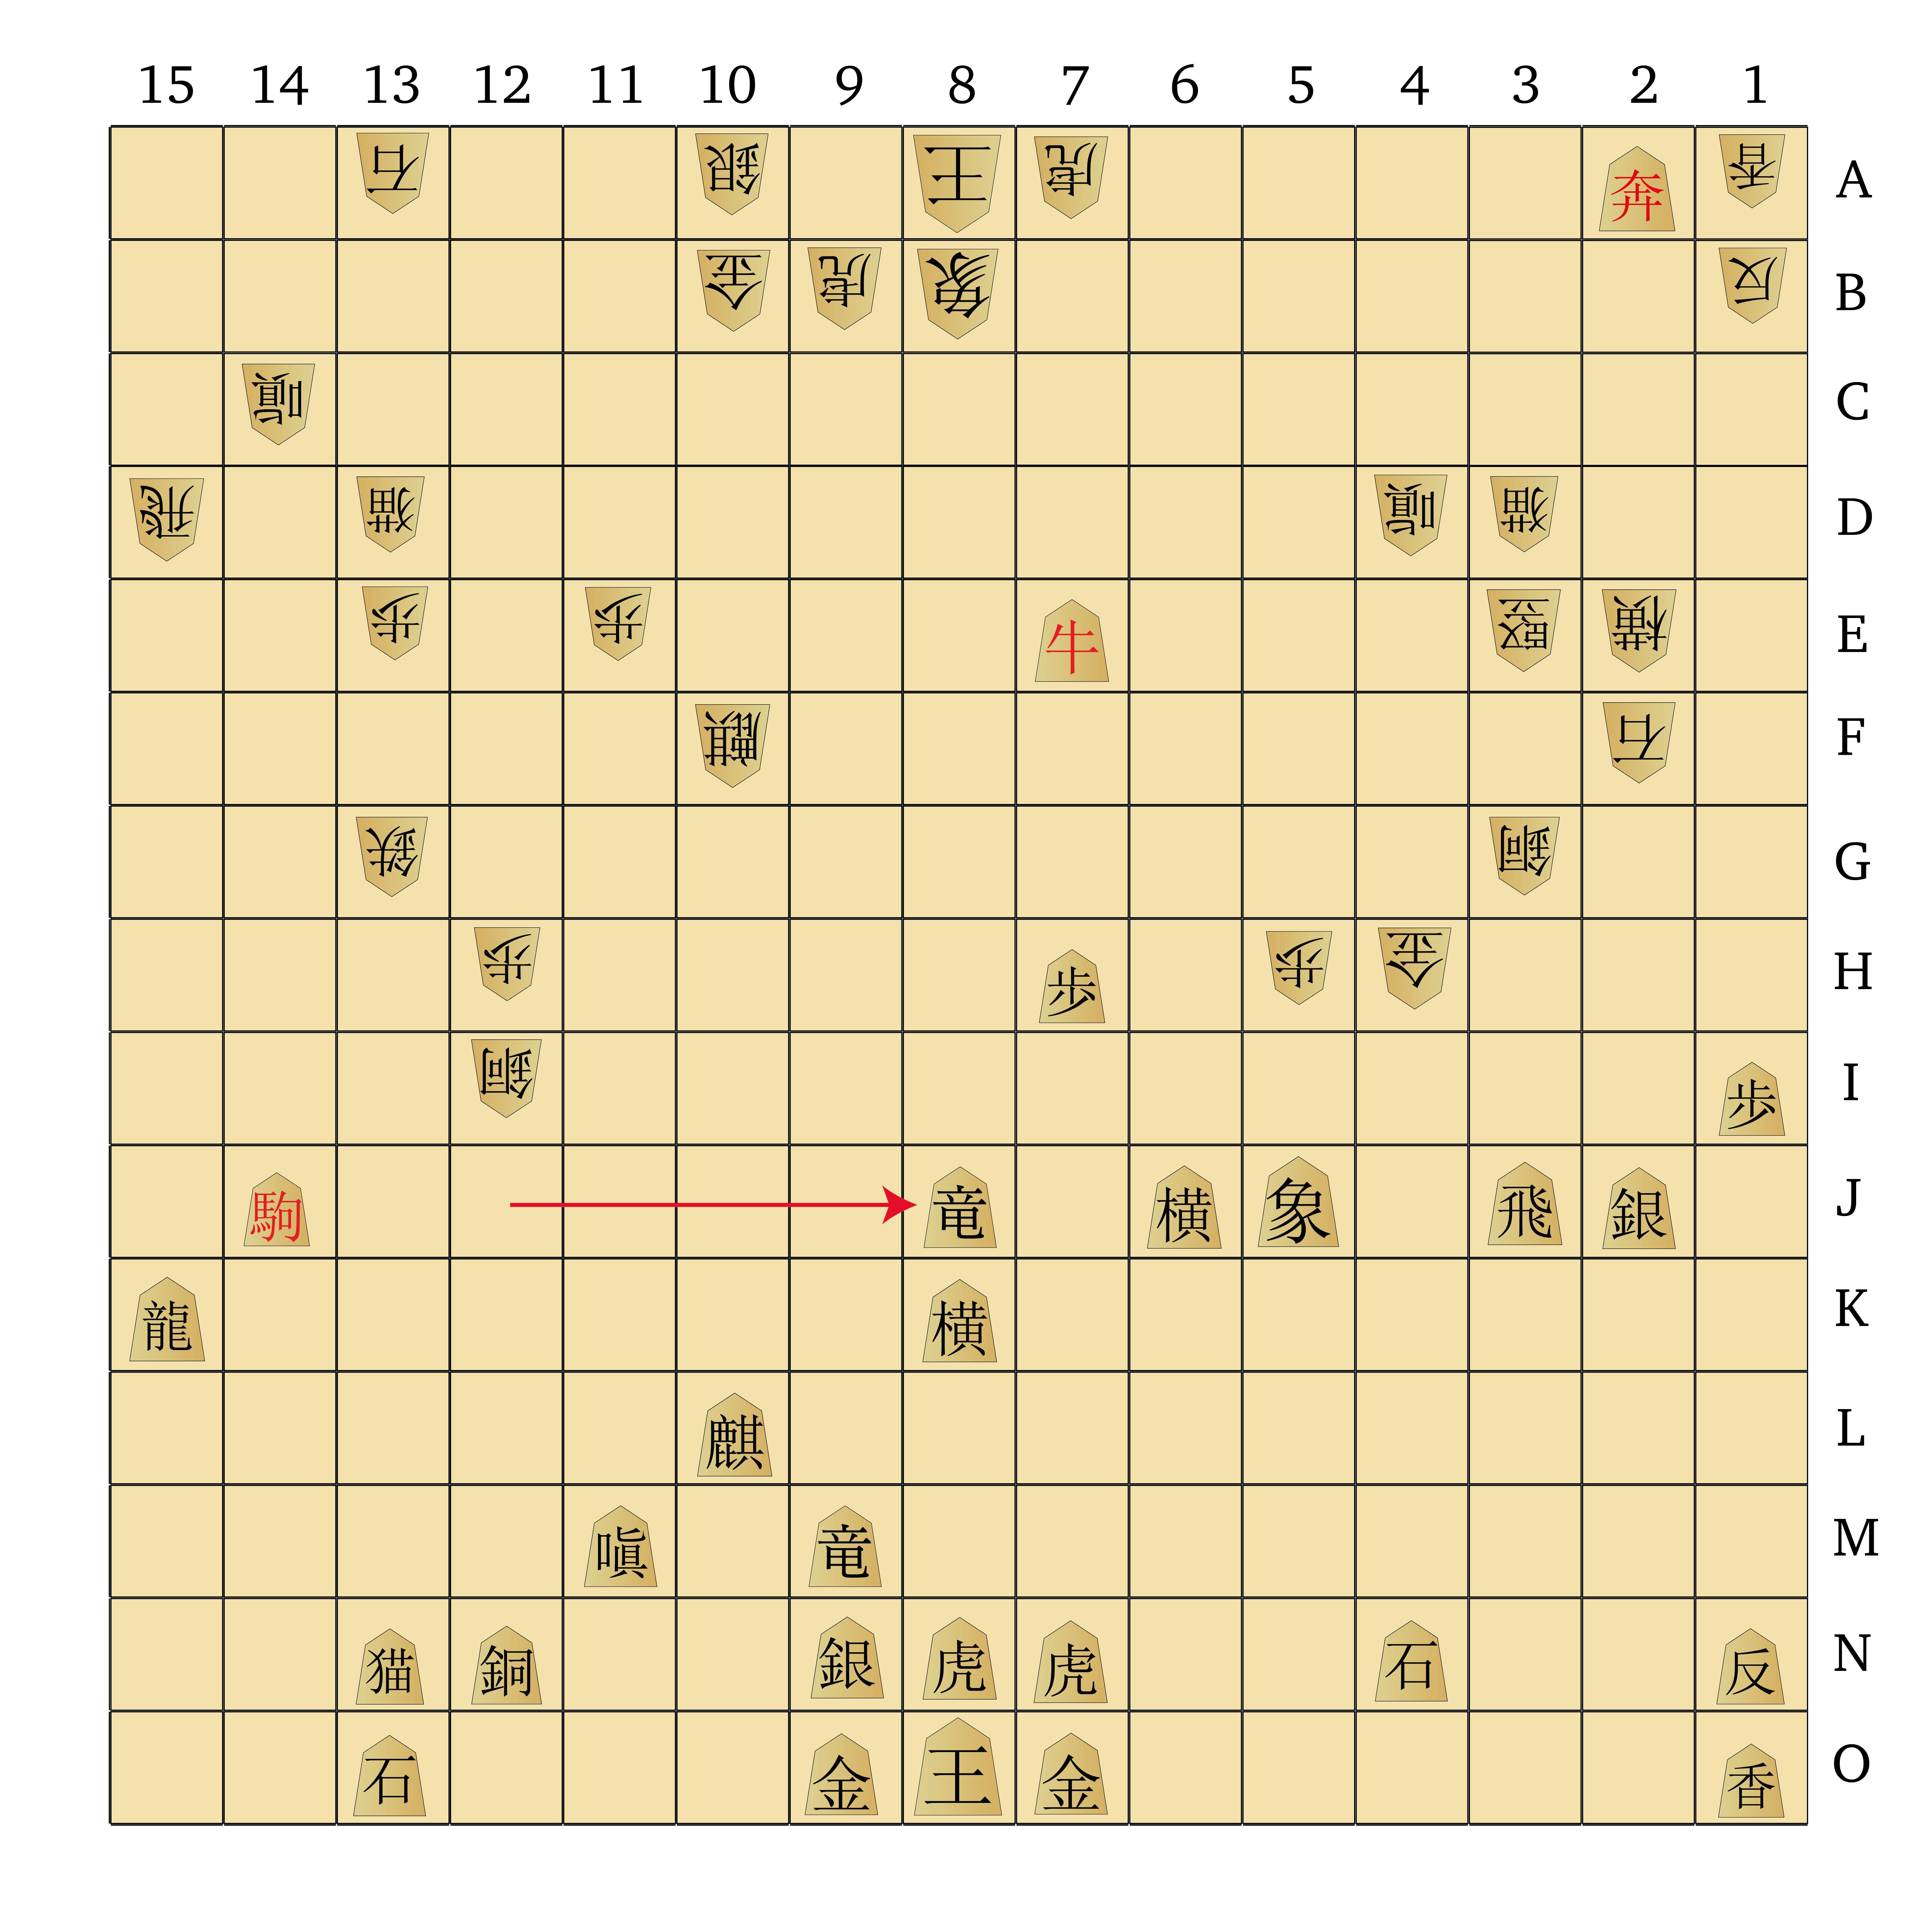 Dai Shogi 420 -- Move 439-01